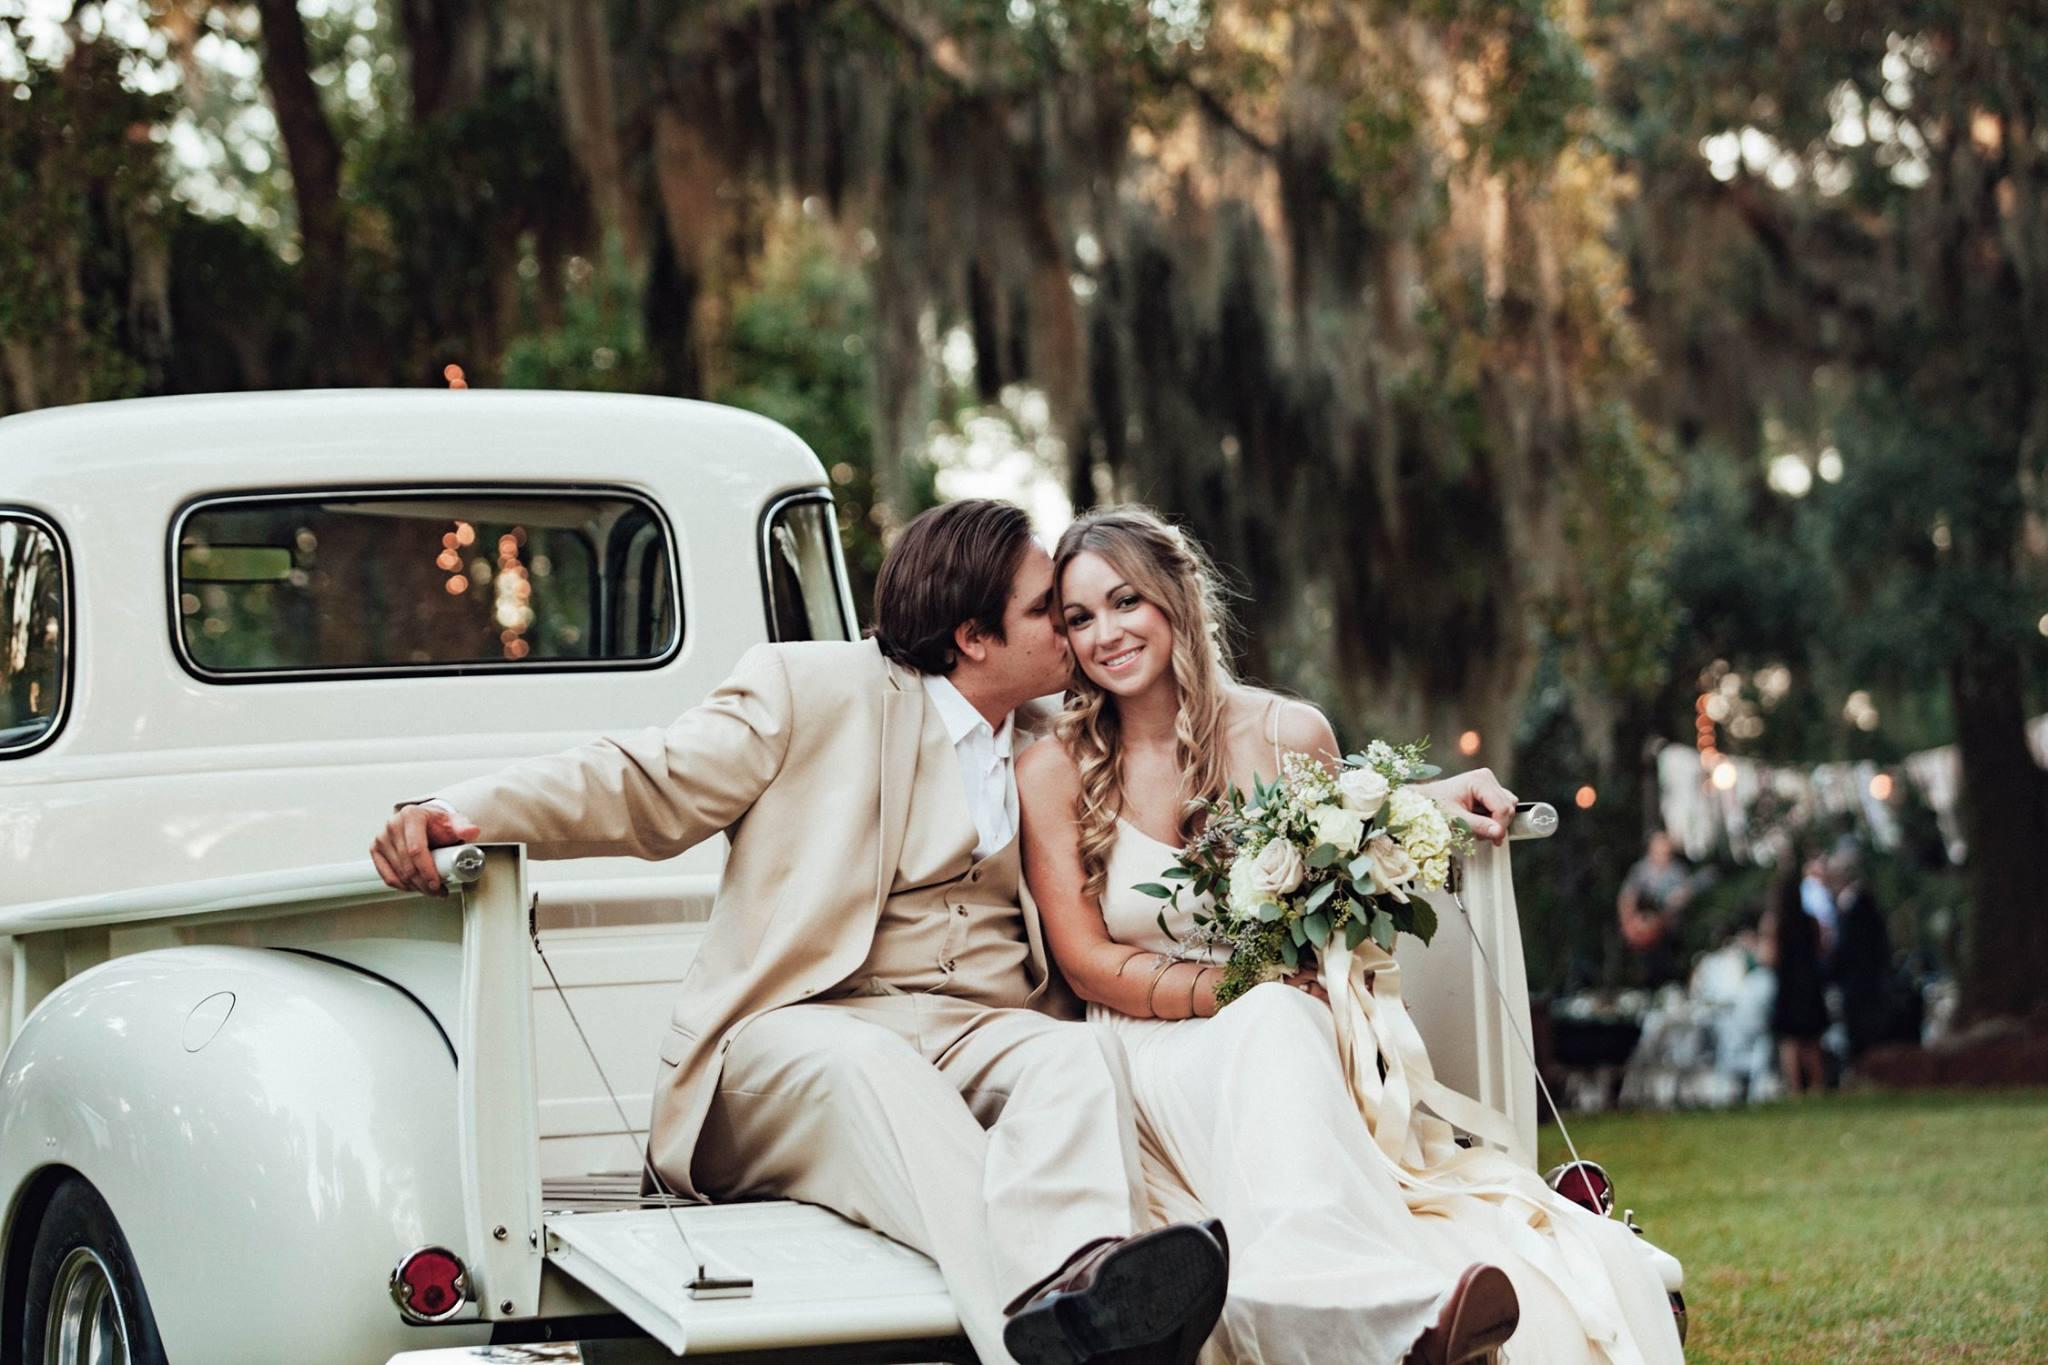 lindy-garvin-rebecca-schoneveld-vivian-sage-blush-wedding-dress-blush-bridal-gown-handmade-wedding-dress-ivory-and-beau-bridal-boutique-savannah-wedding-dresses-savannah-bridal-boutique-savannah-weddings-savannah-brides-jacksonville-bridal-boutique-14.jpg